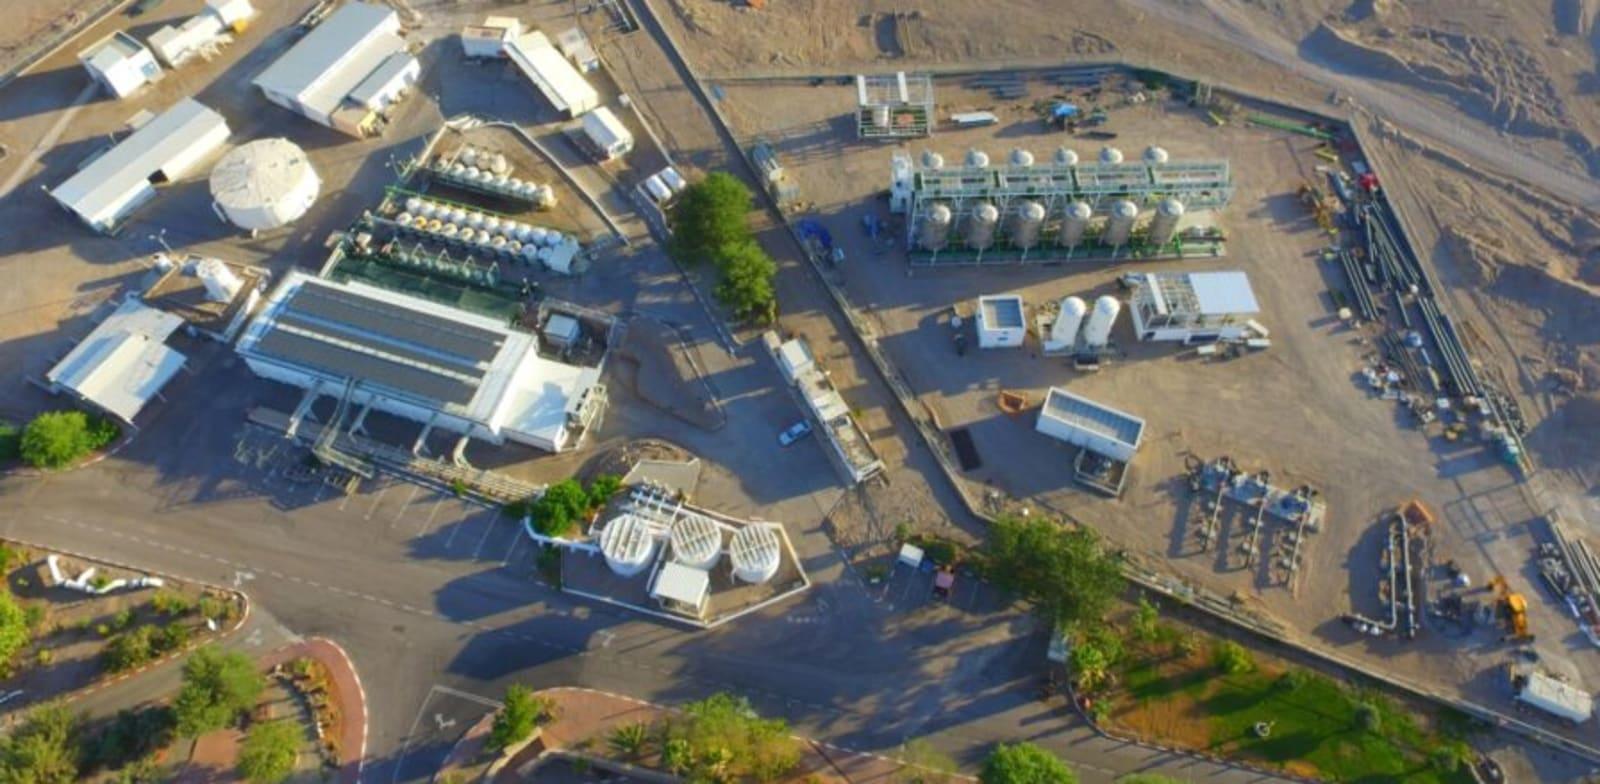 Eilat desalination plant Photo: Company website